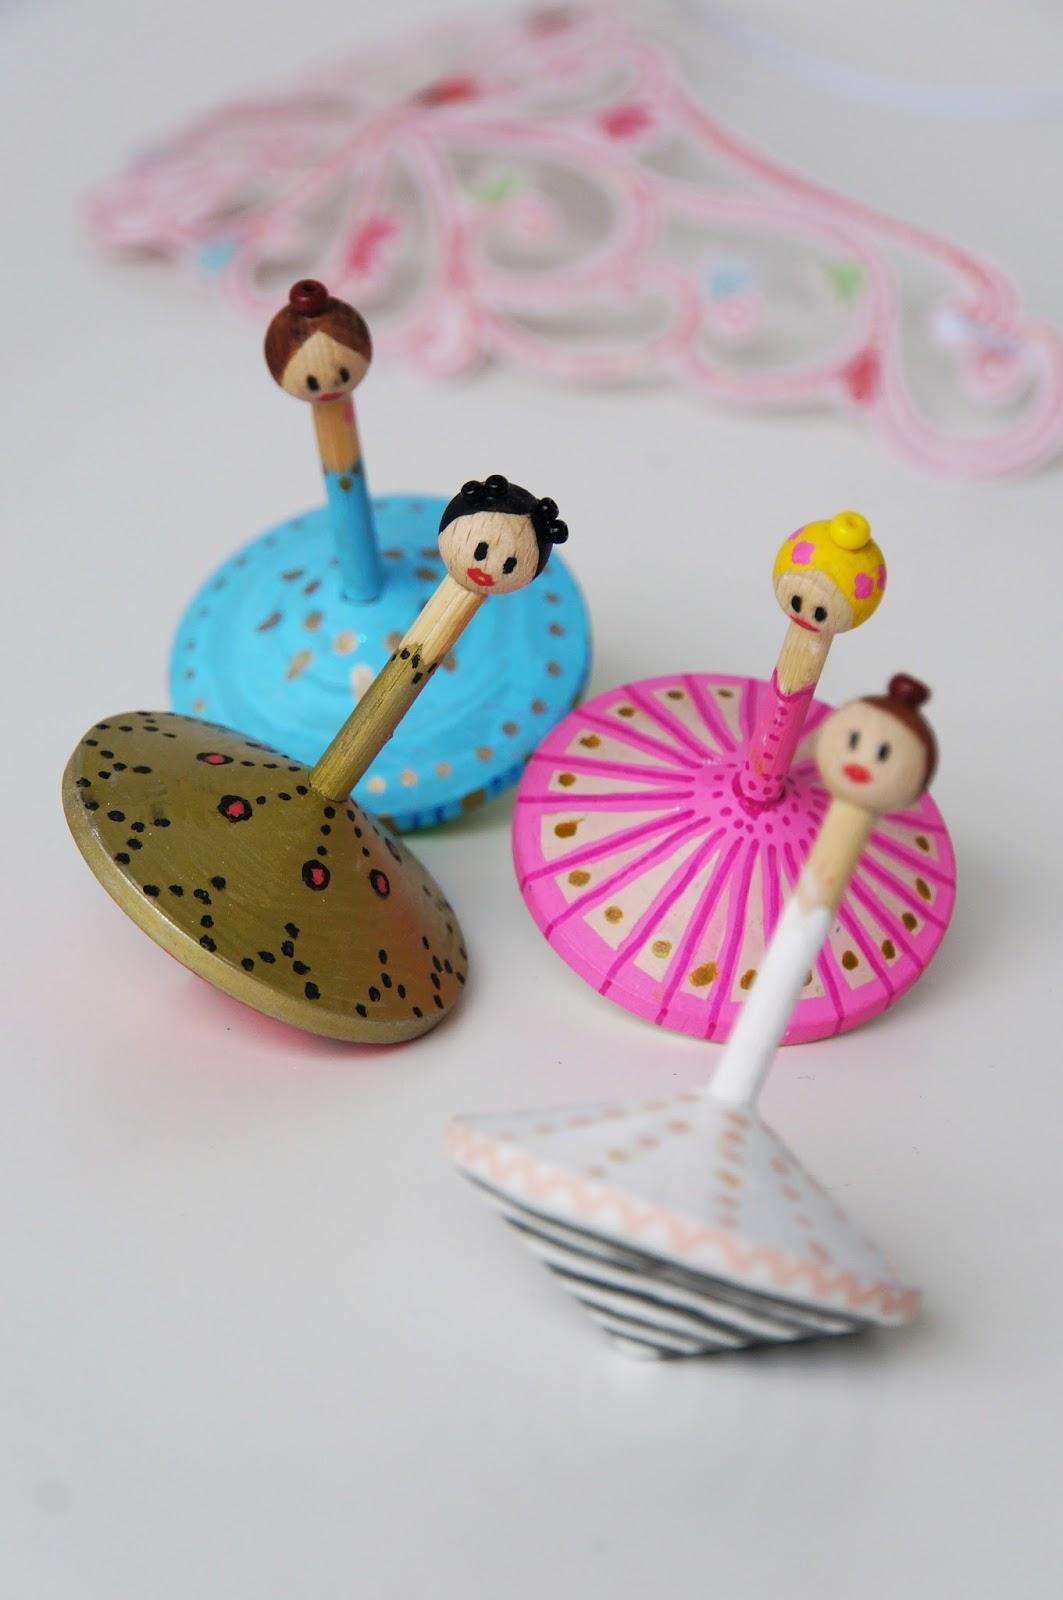 basteln malen kuchen backen ballerinaparty